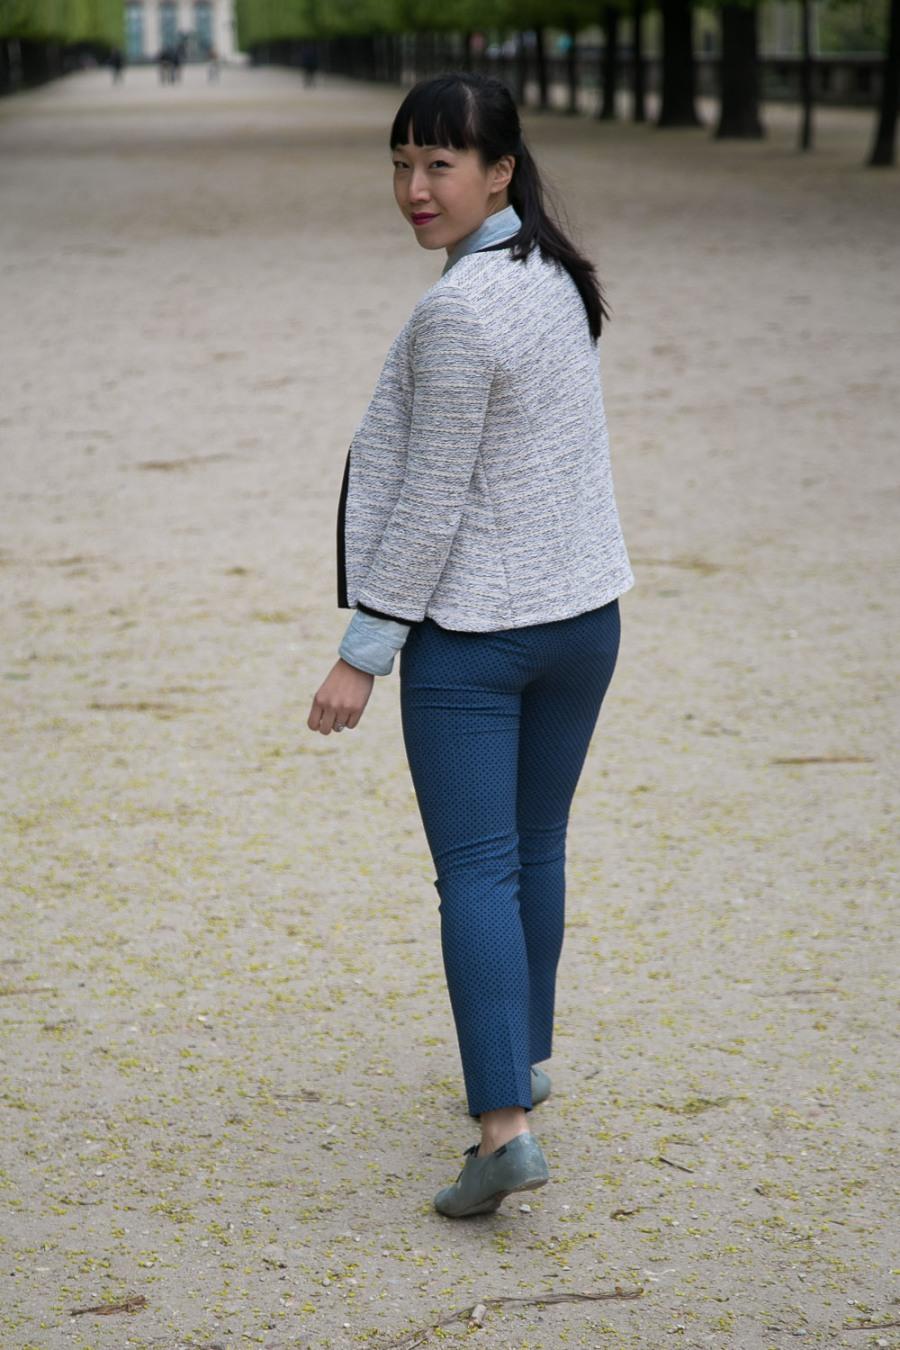 Boucle-Tuileries-Garden-7